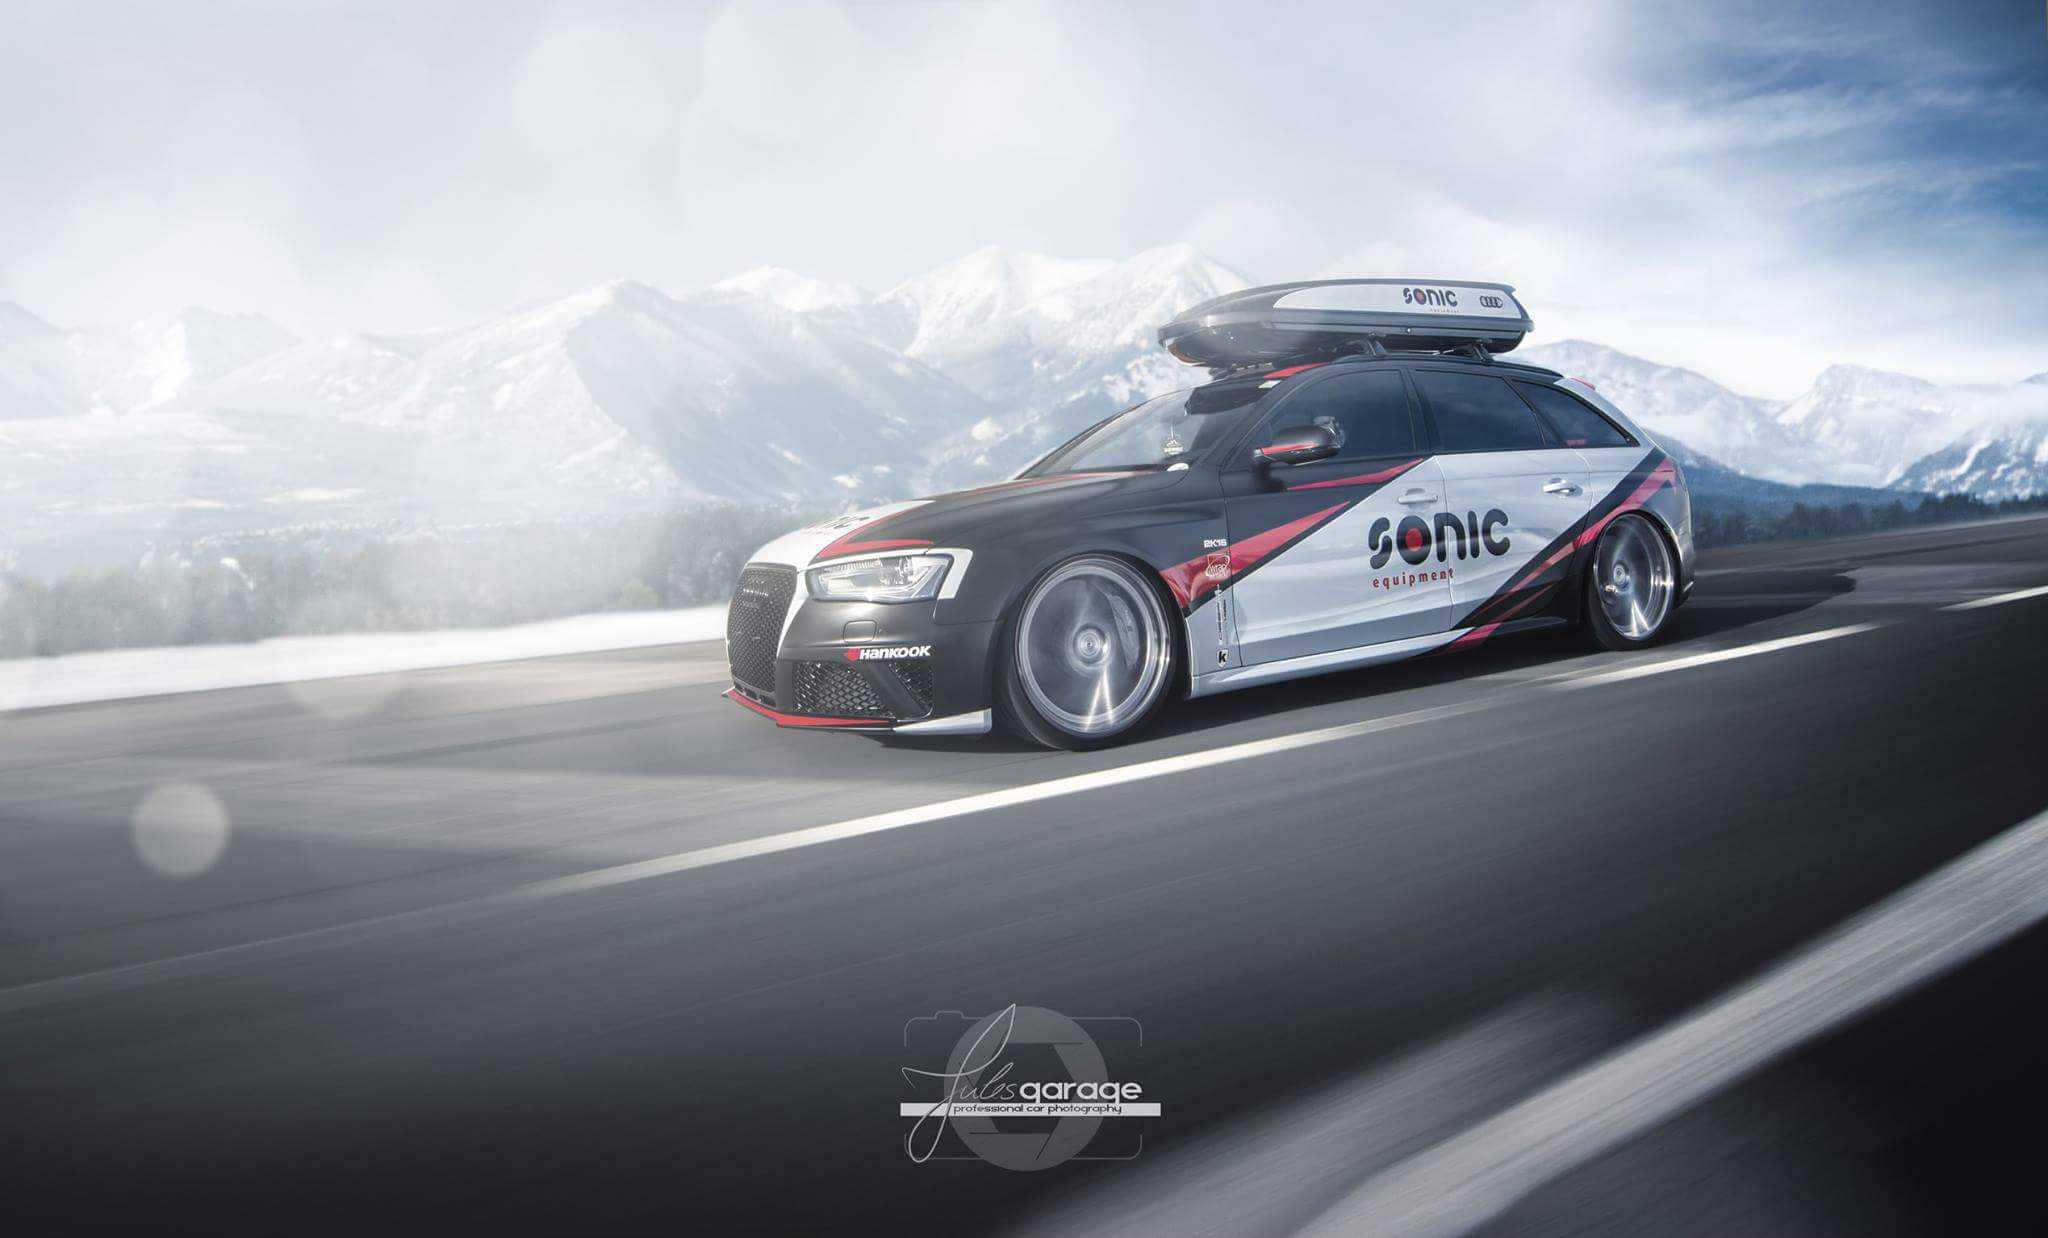 Audi Sonic RS 4